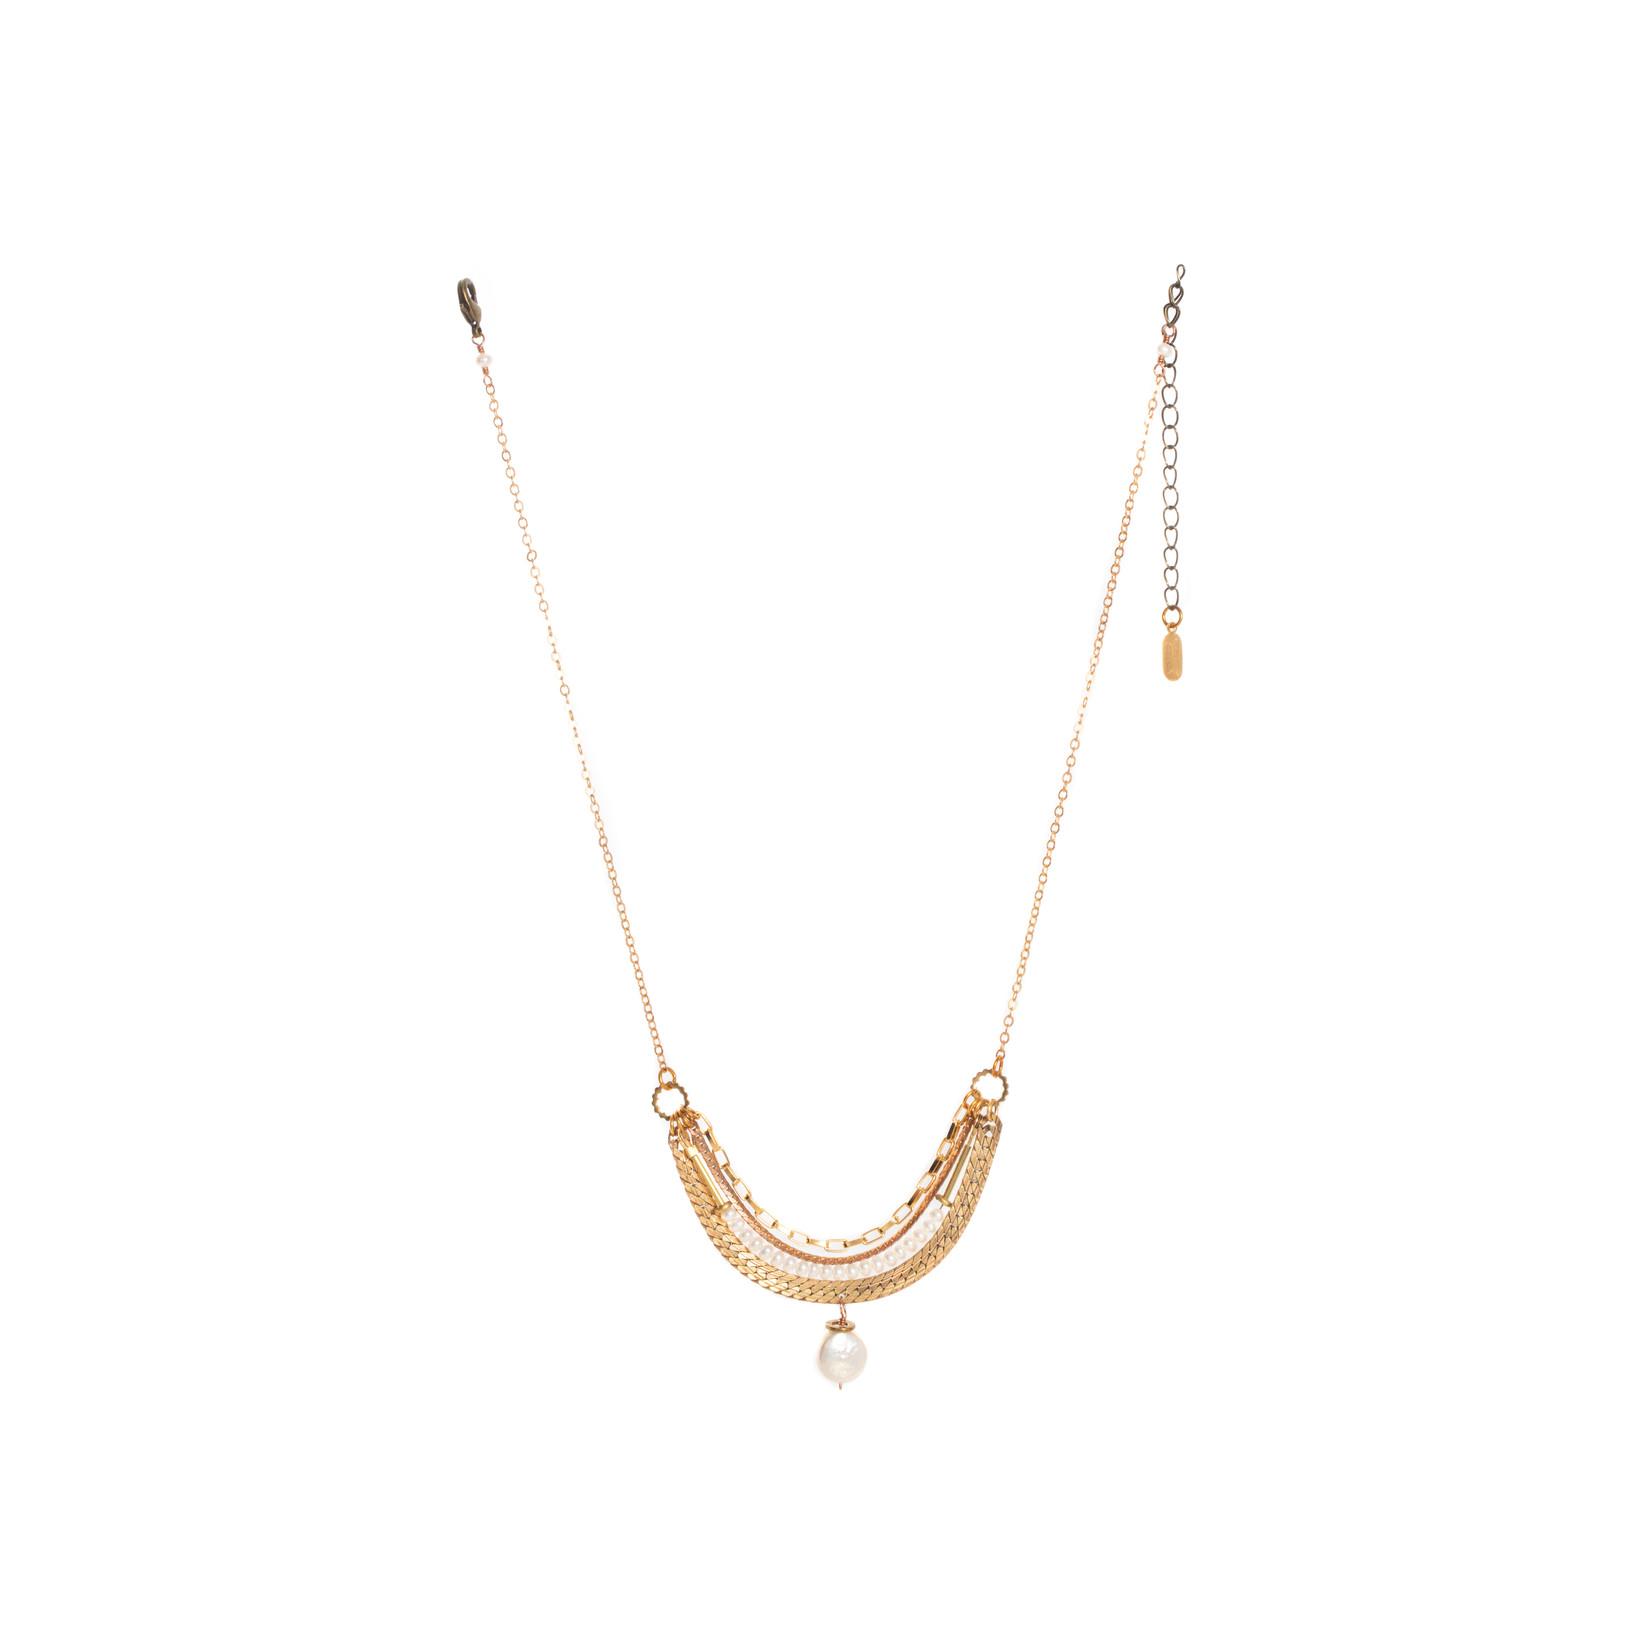 Hailey Gerrits Coastal Necklace